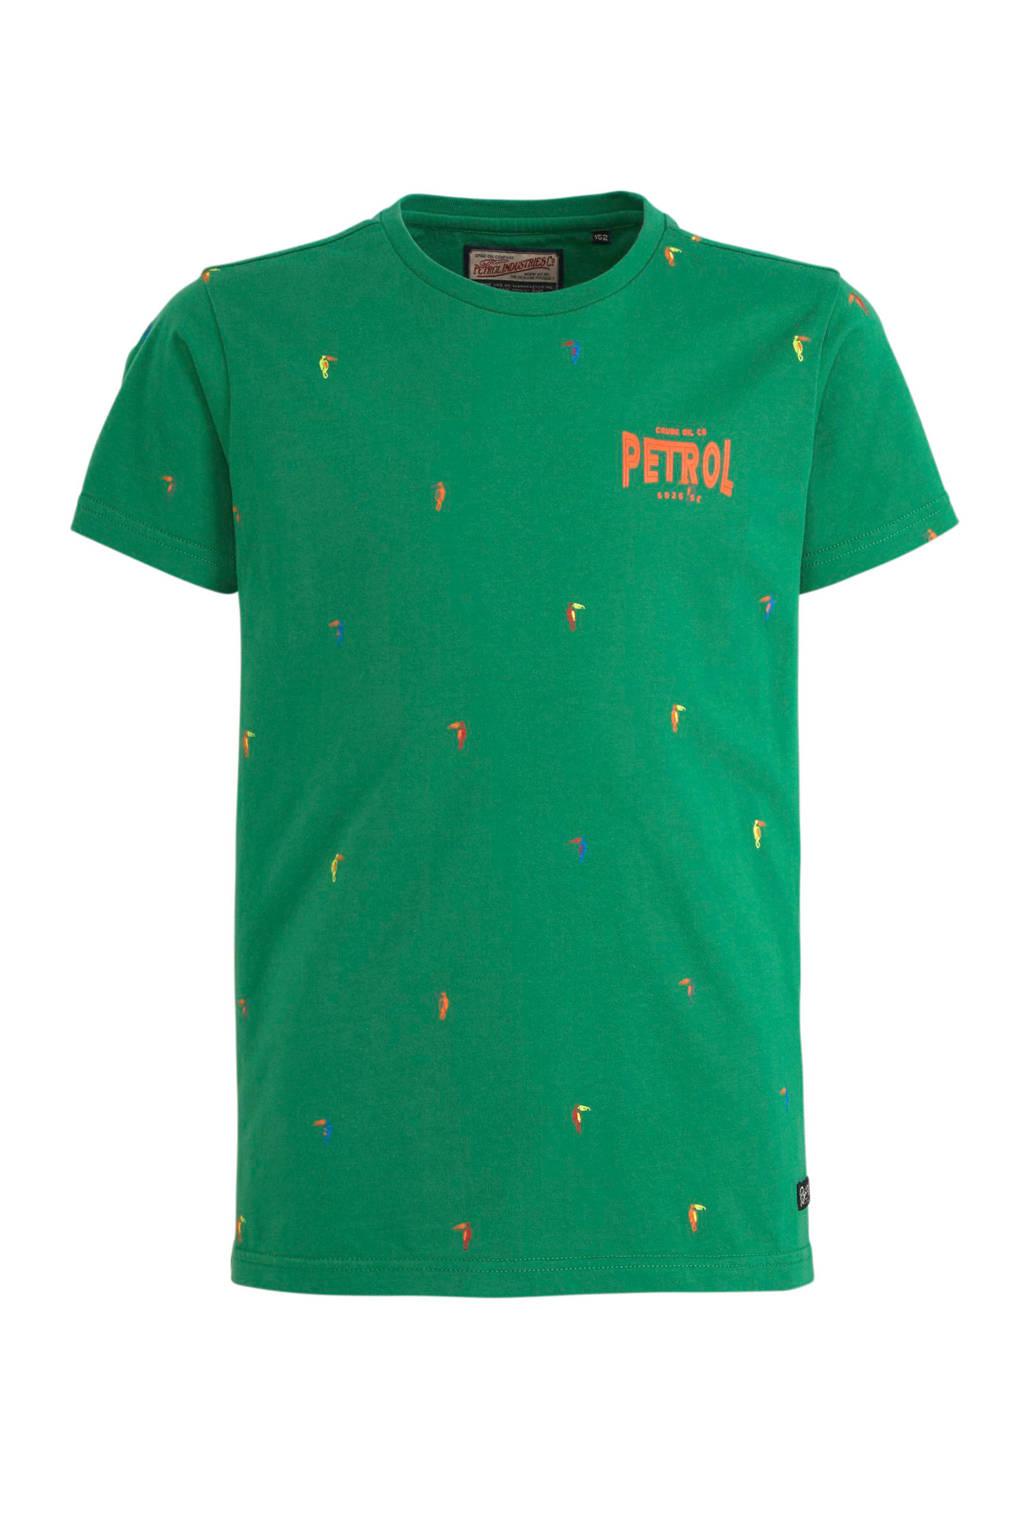 Petrol Industries T-shirt met all over print groen, Groen